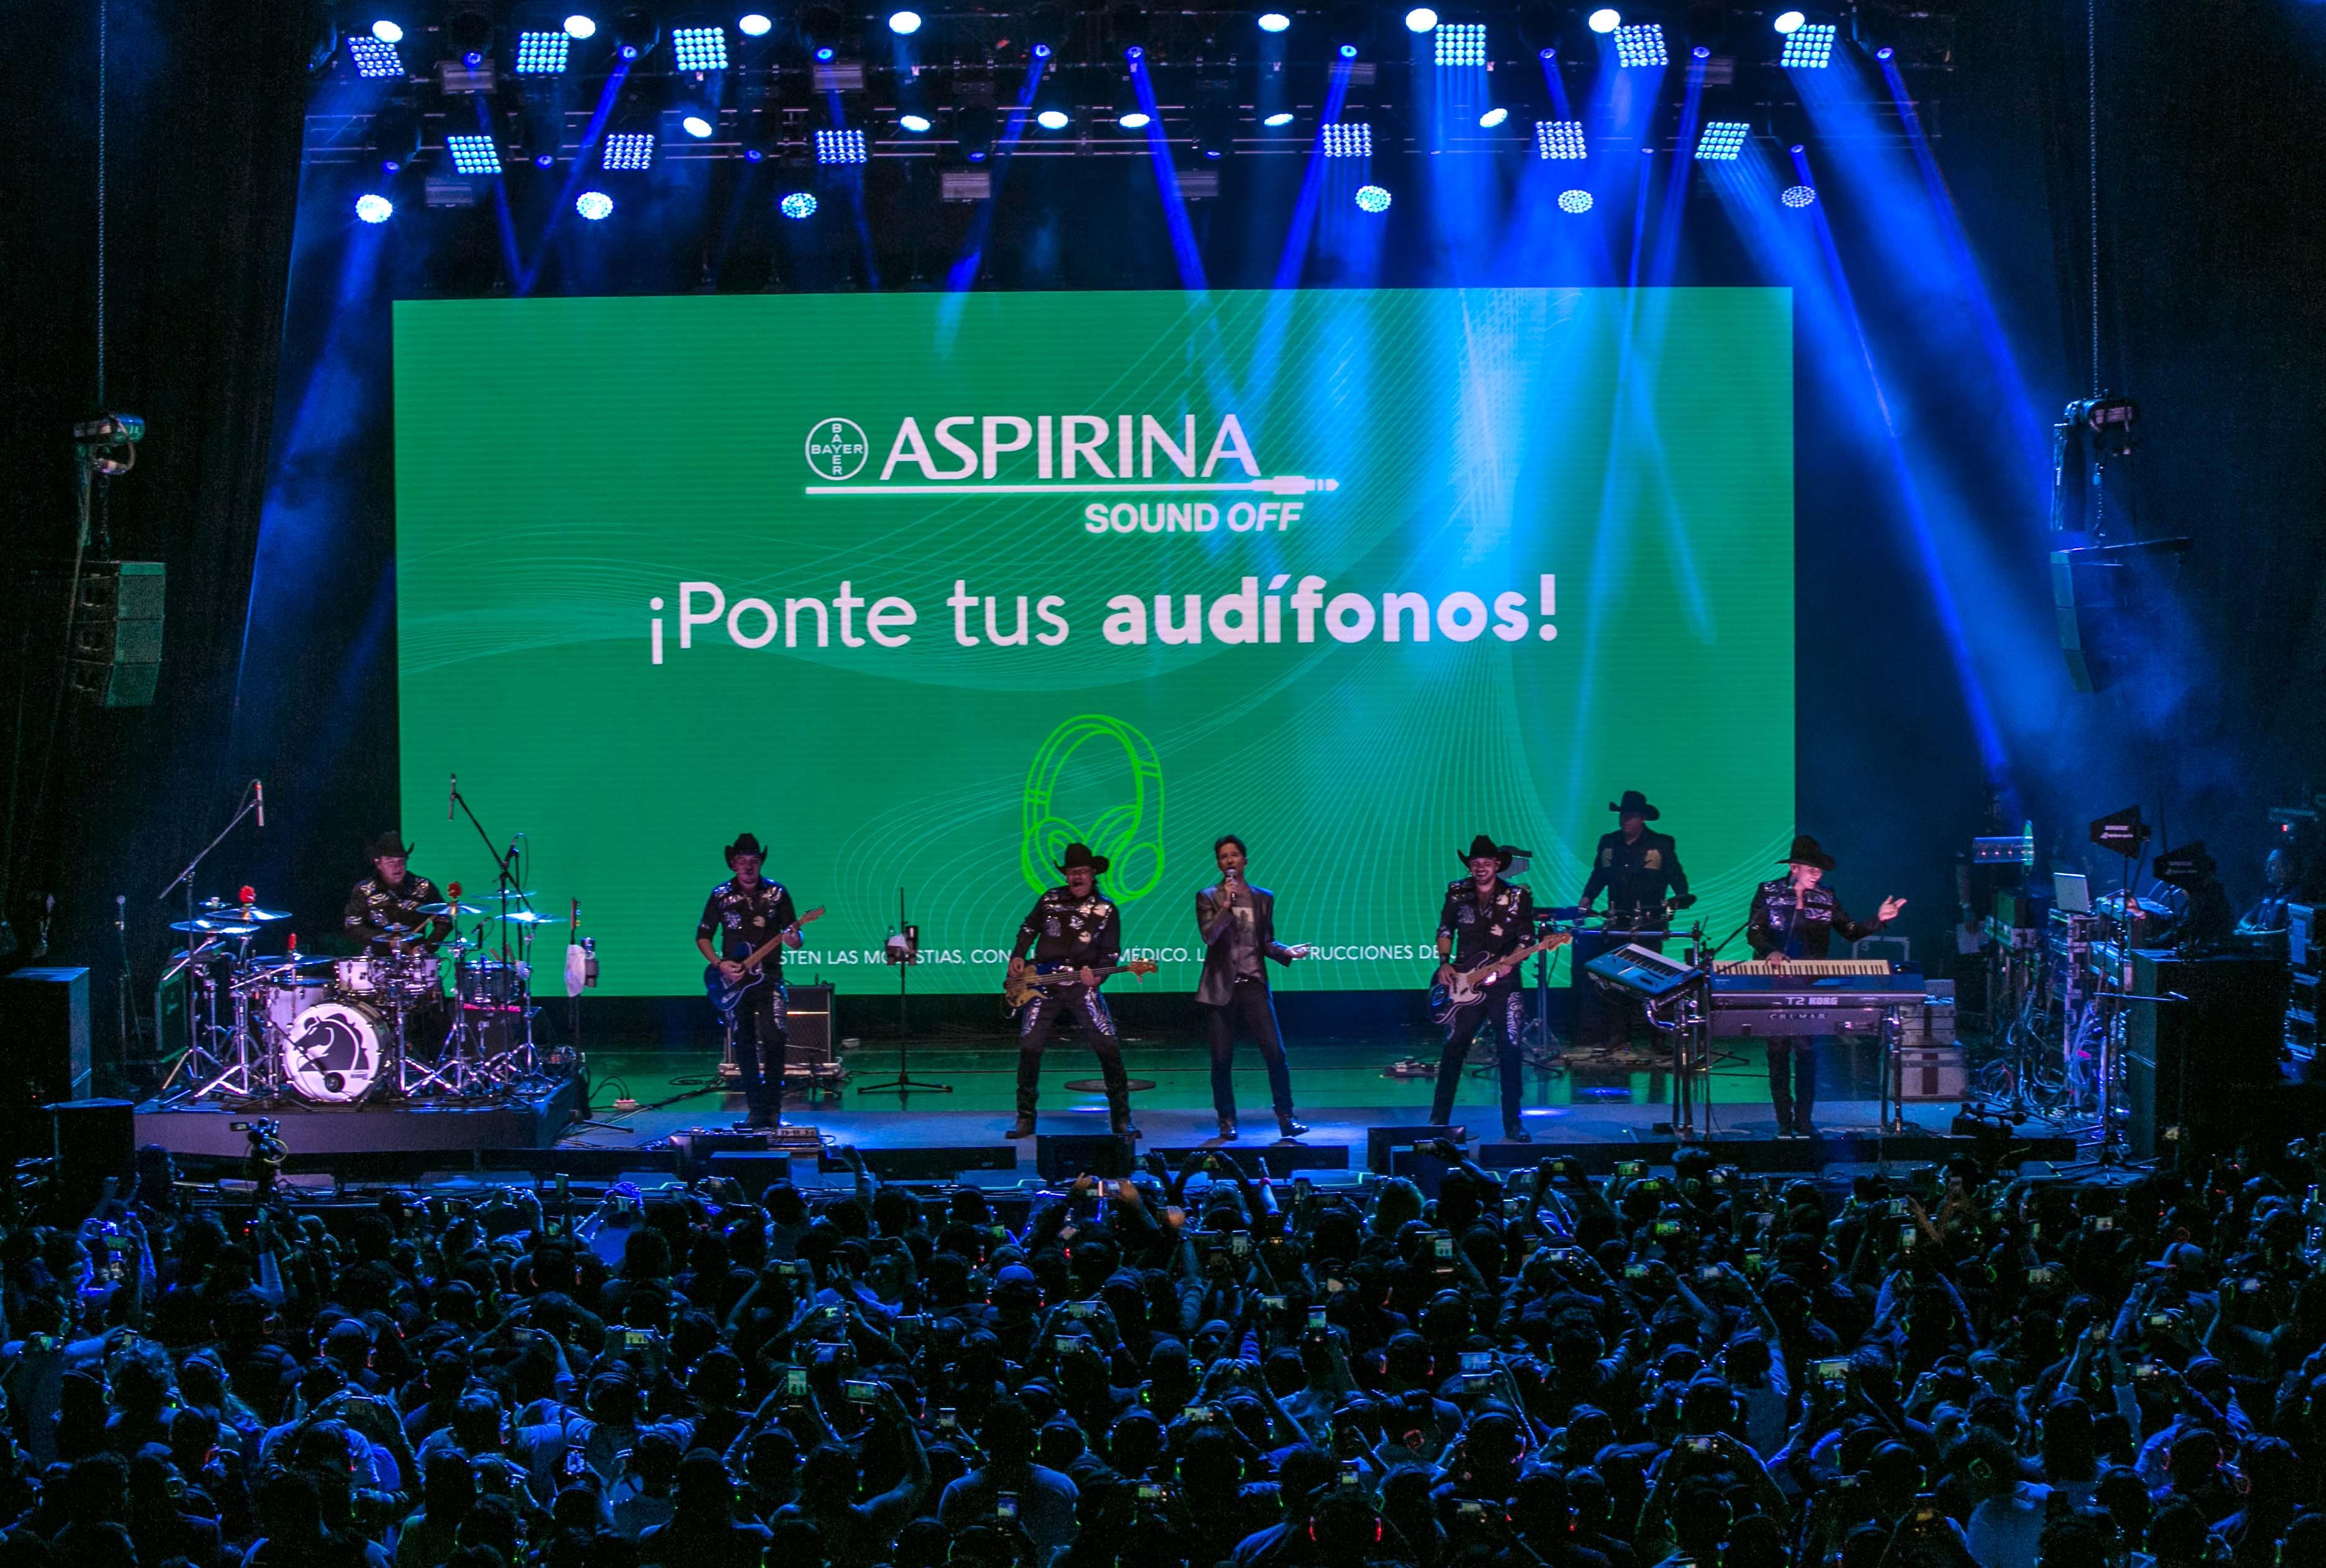 Silent Concert Aspirina Sound Off 5